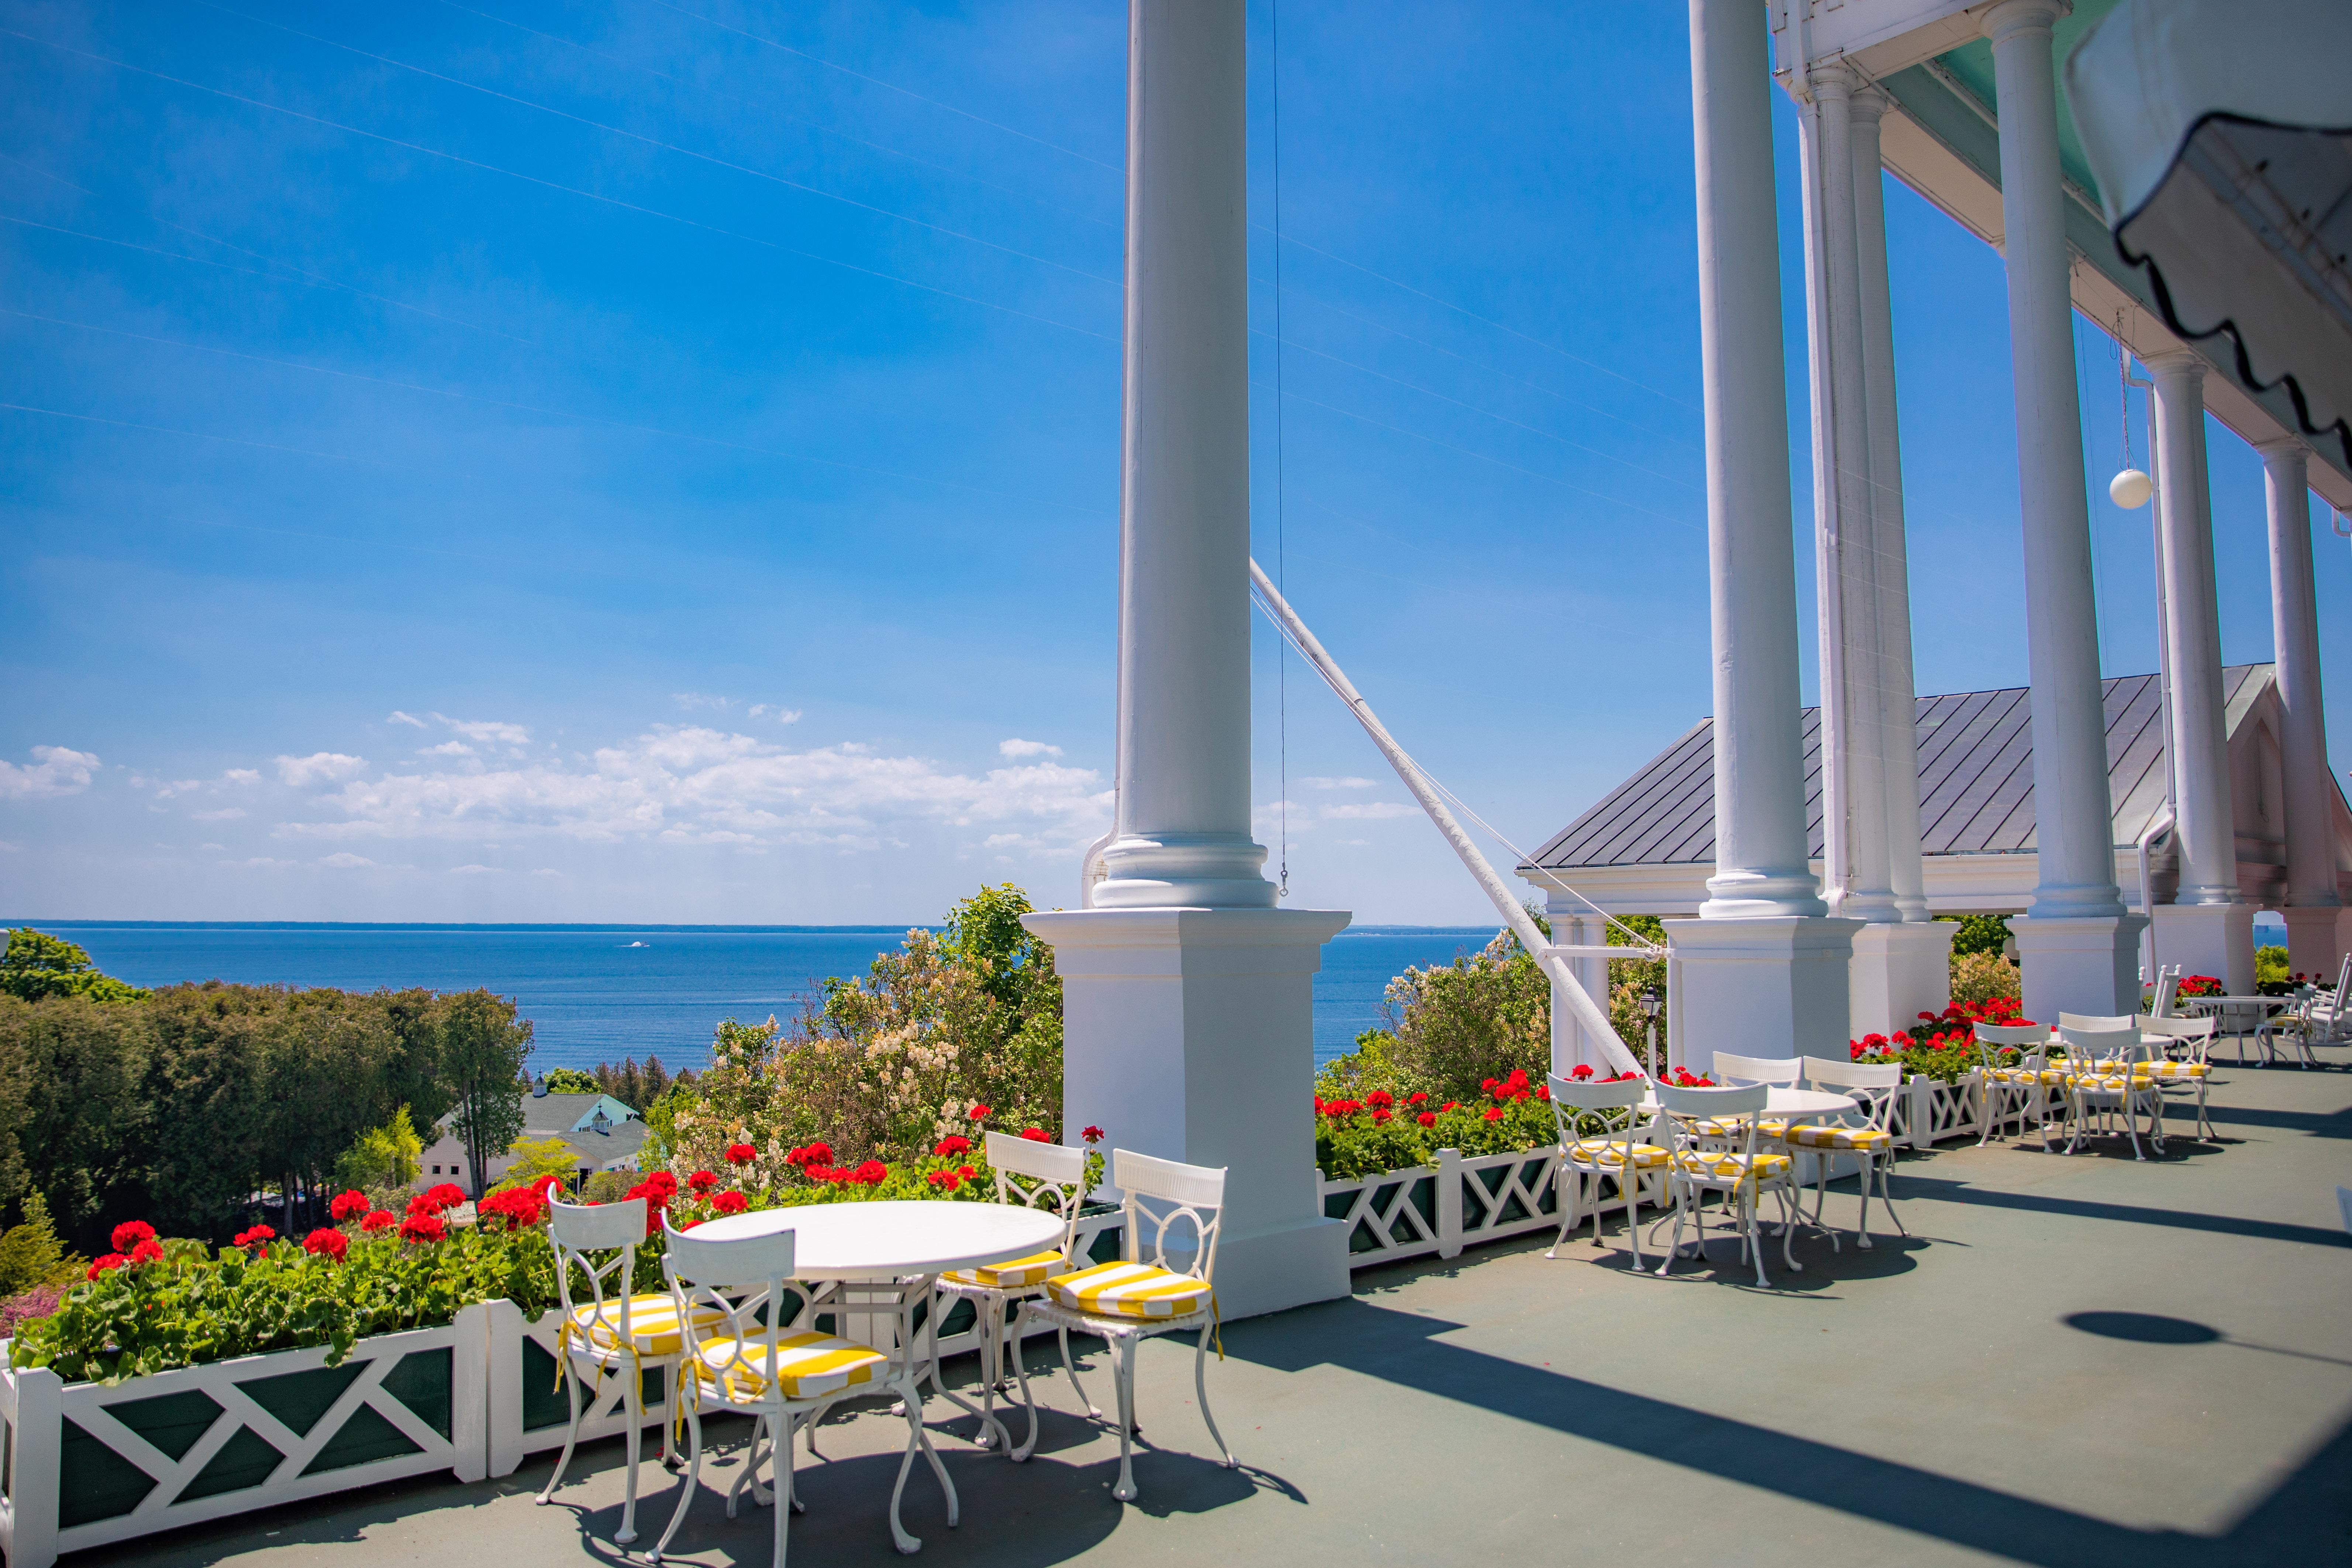 Mackinac Island S Grand Hotel To Open For 2020 Season Get A Sneak Peek Mlive Com